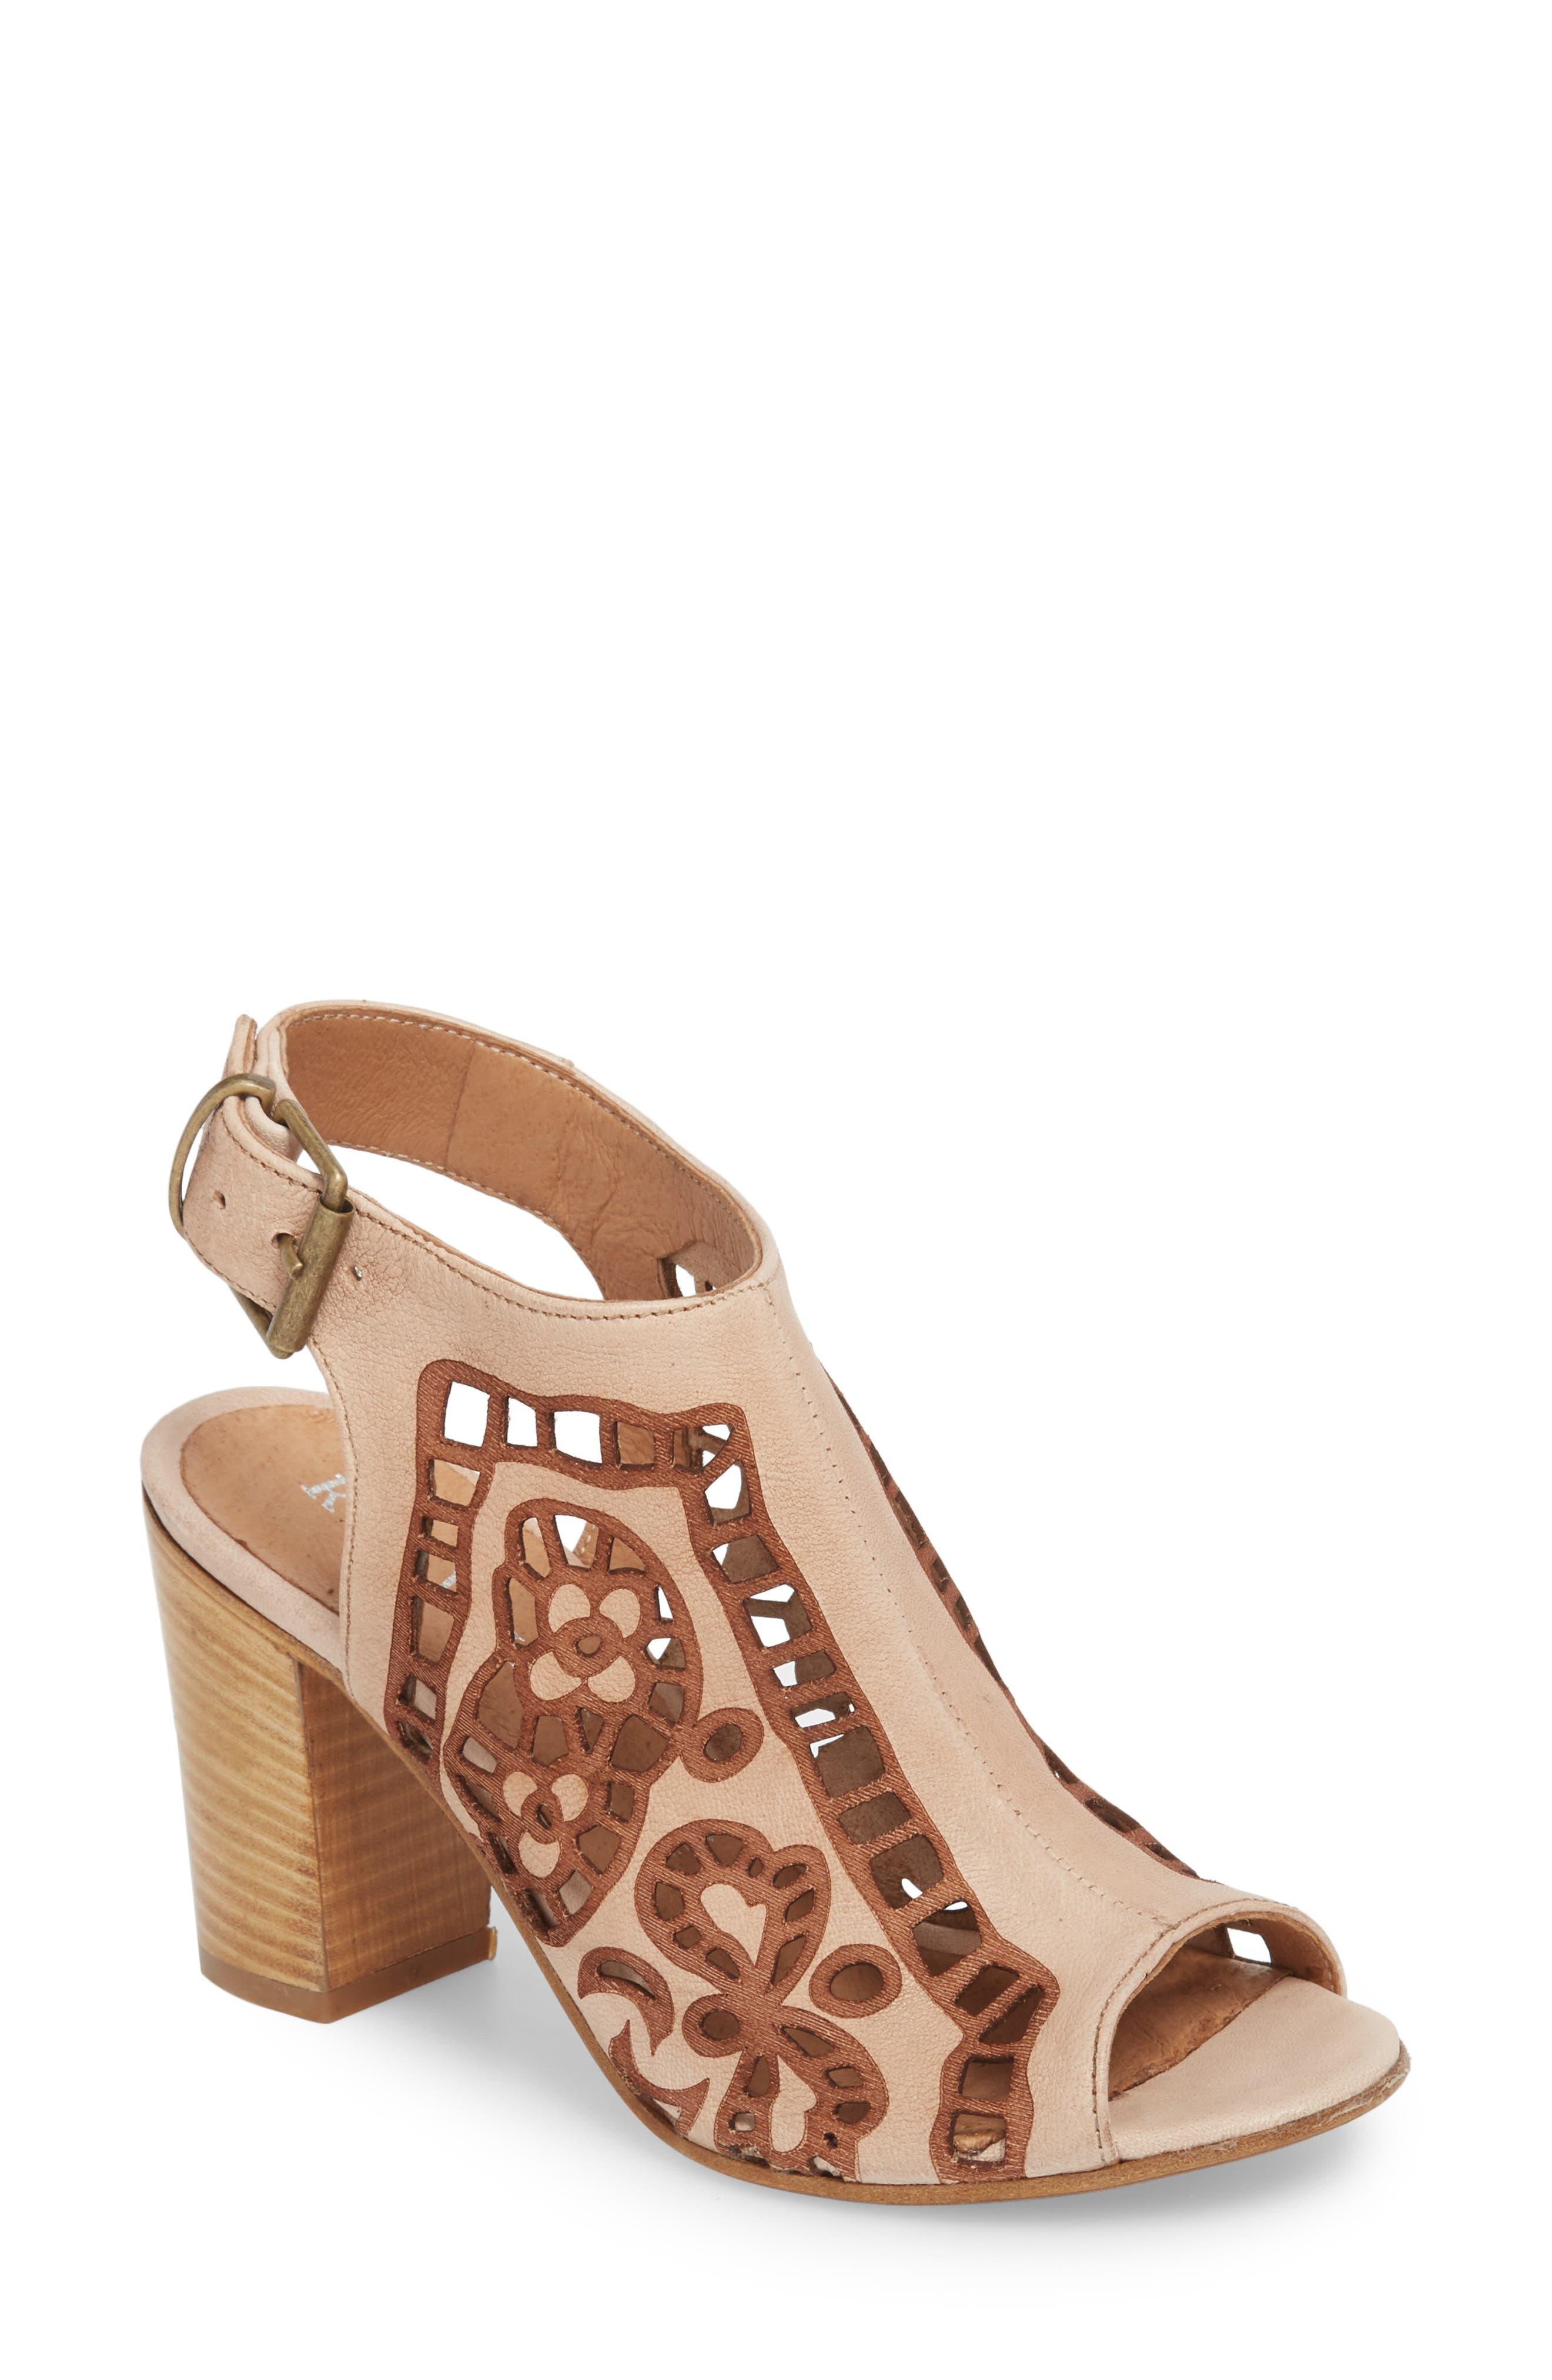 Sabrina Floral Cutout Shield Sandal,                         Main,                         color, Blush Leather